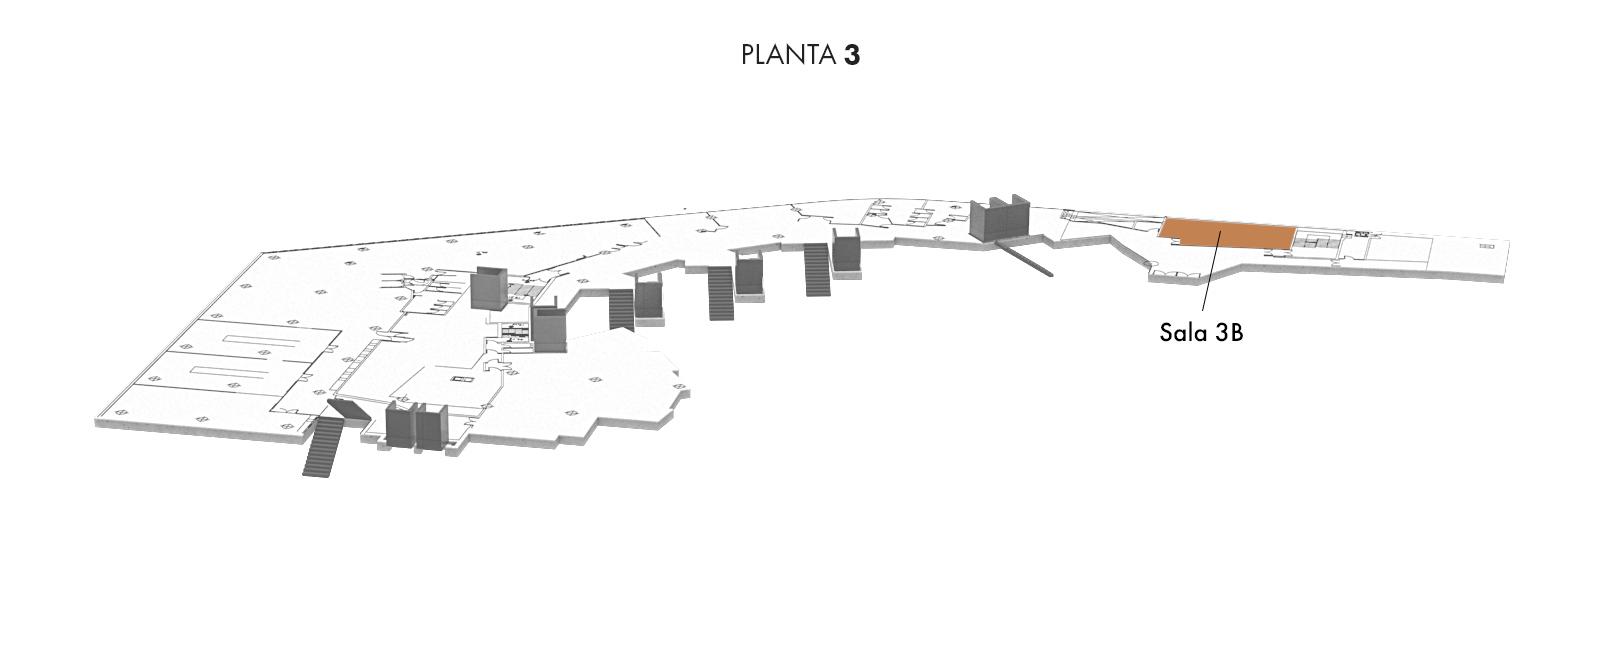 Sala 3B, Planta 3   Palacio Euskalduna Jauregia